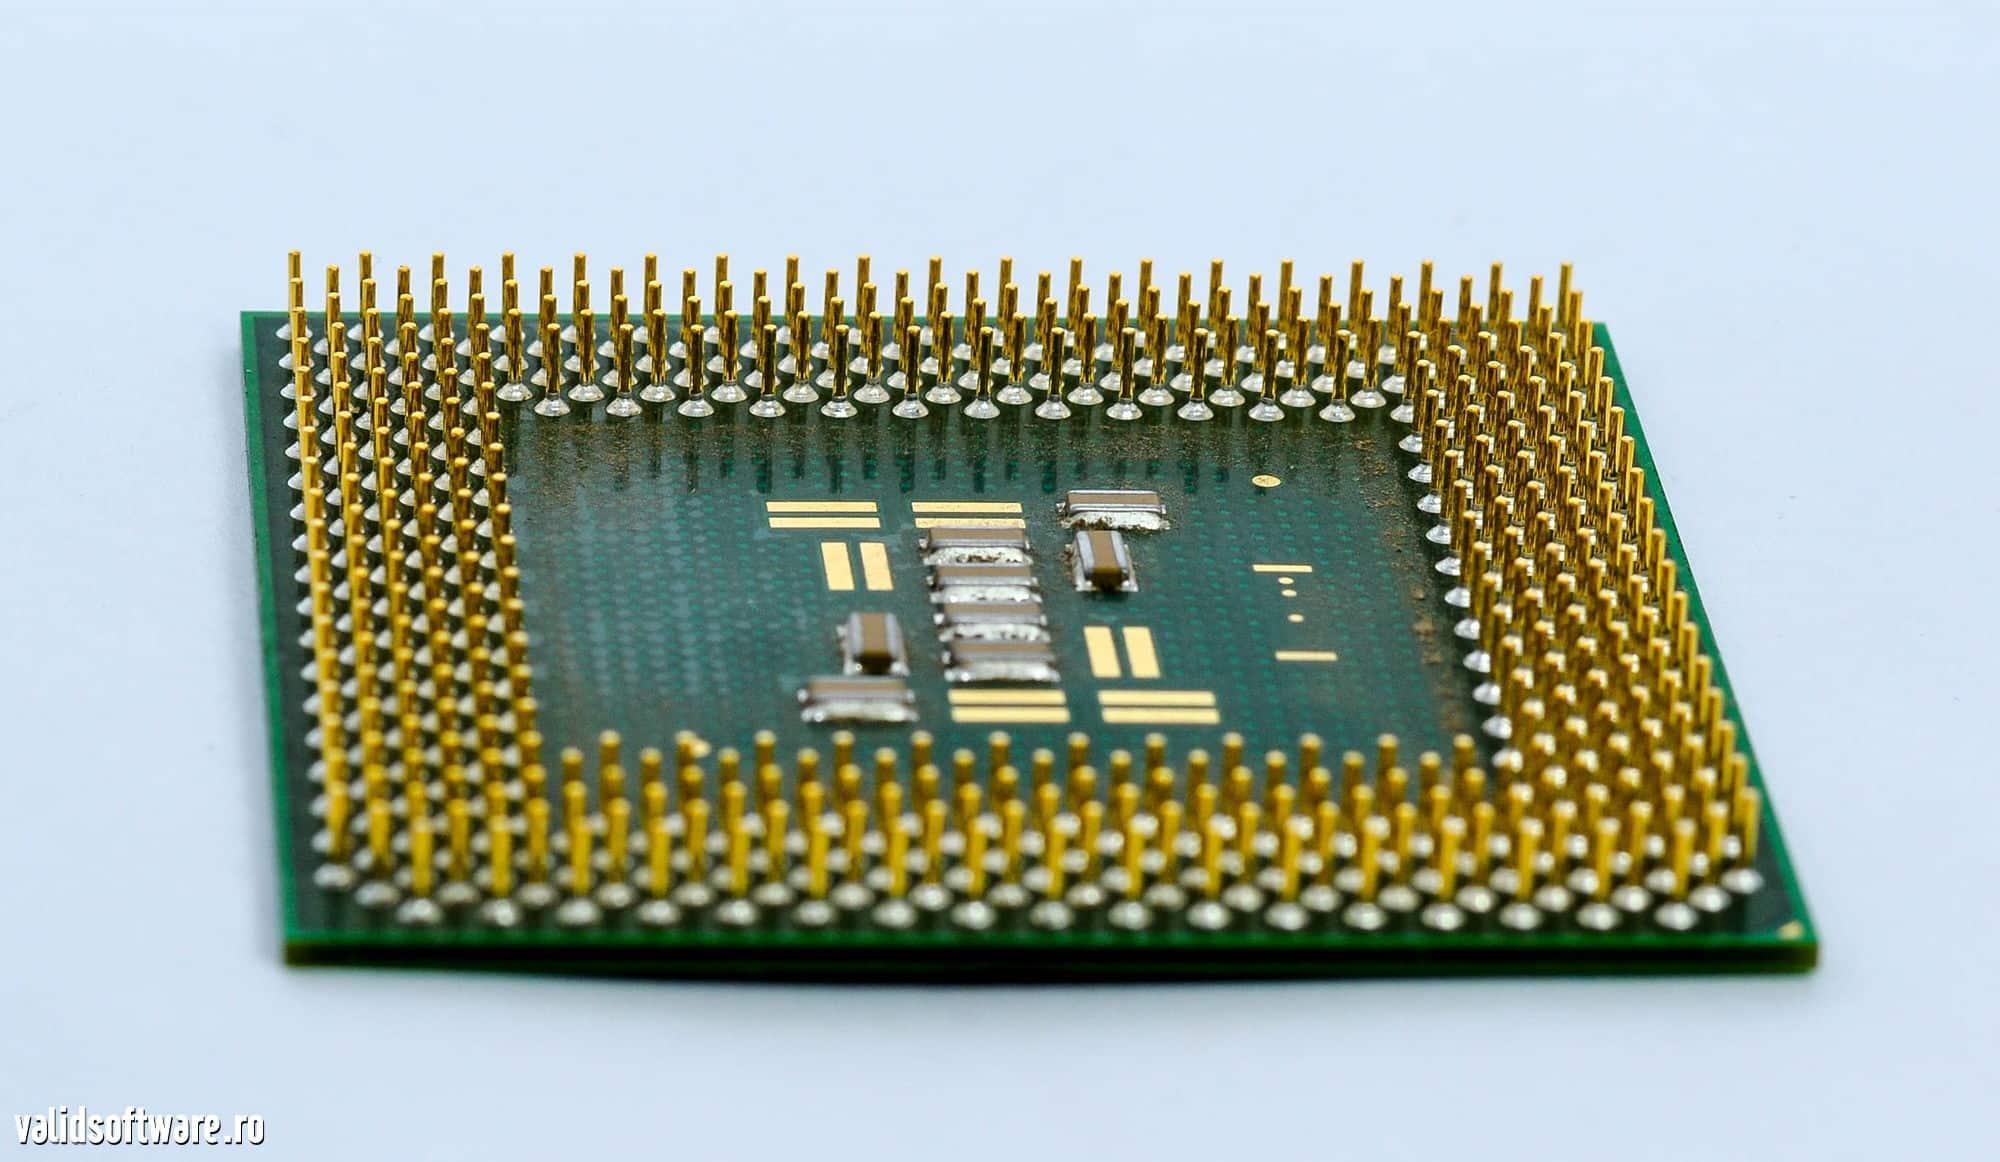 microprocesor calculator 1